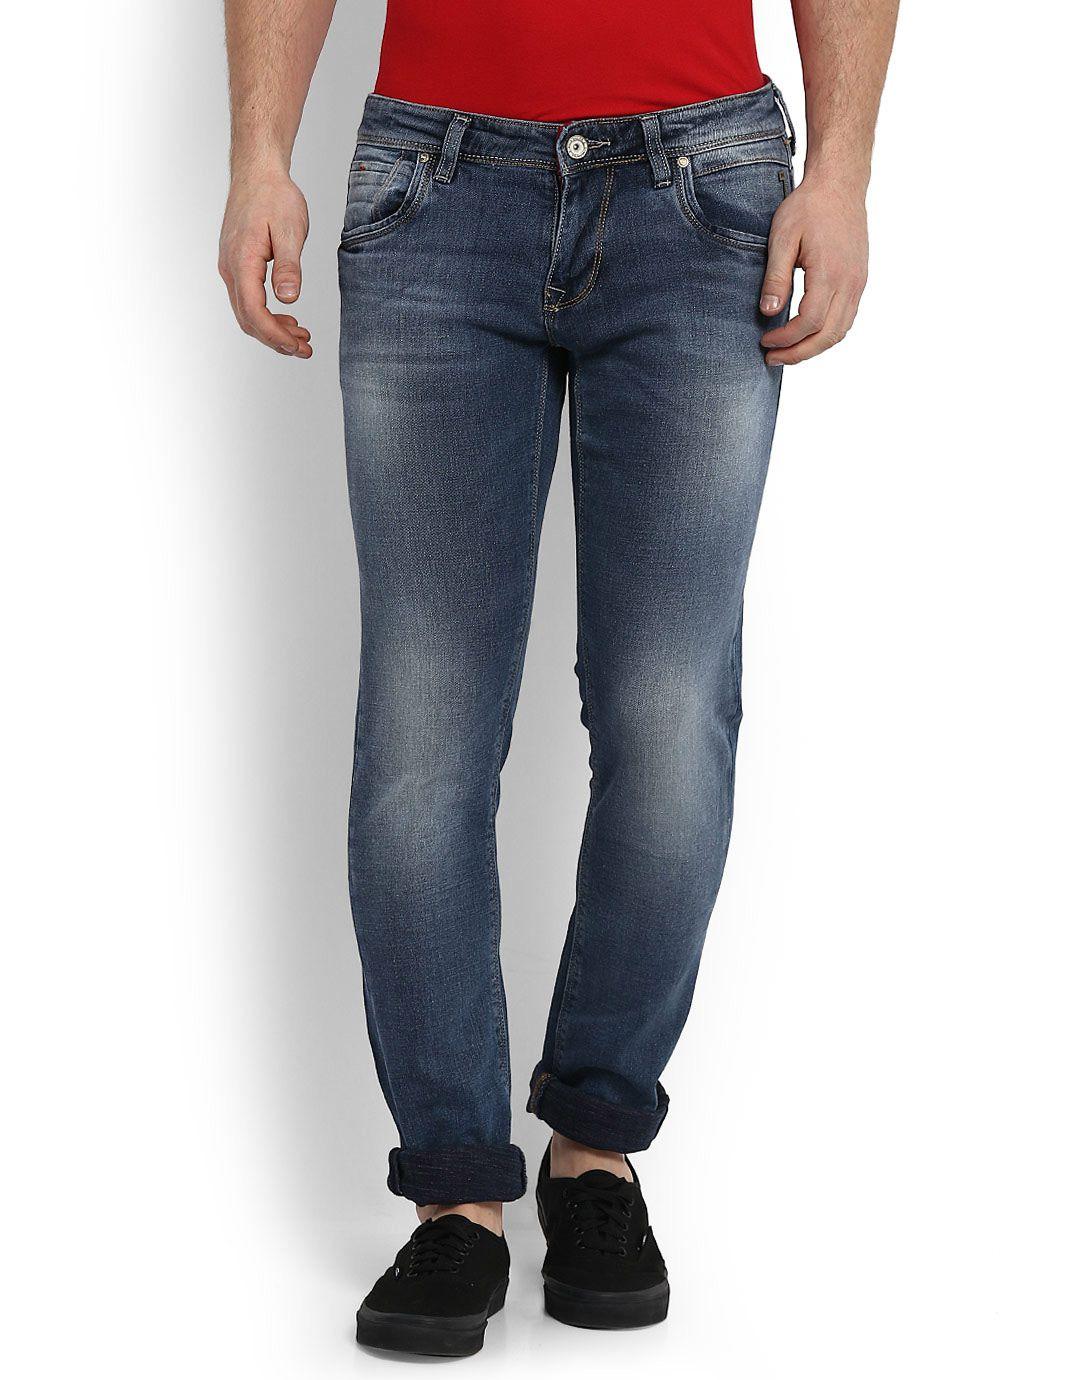 LAWMAN pg3 Blue Skinny Jeans